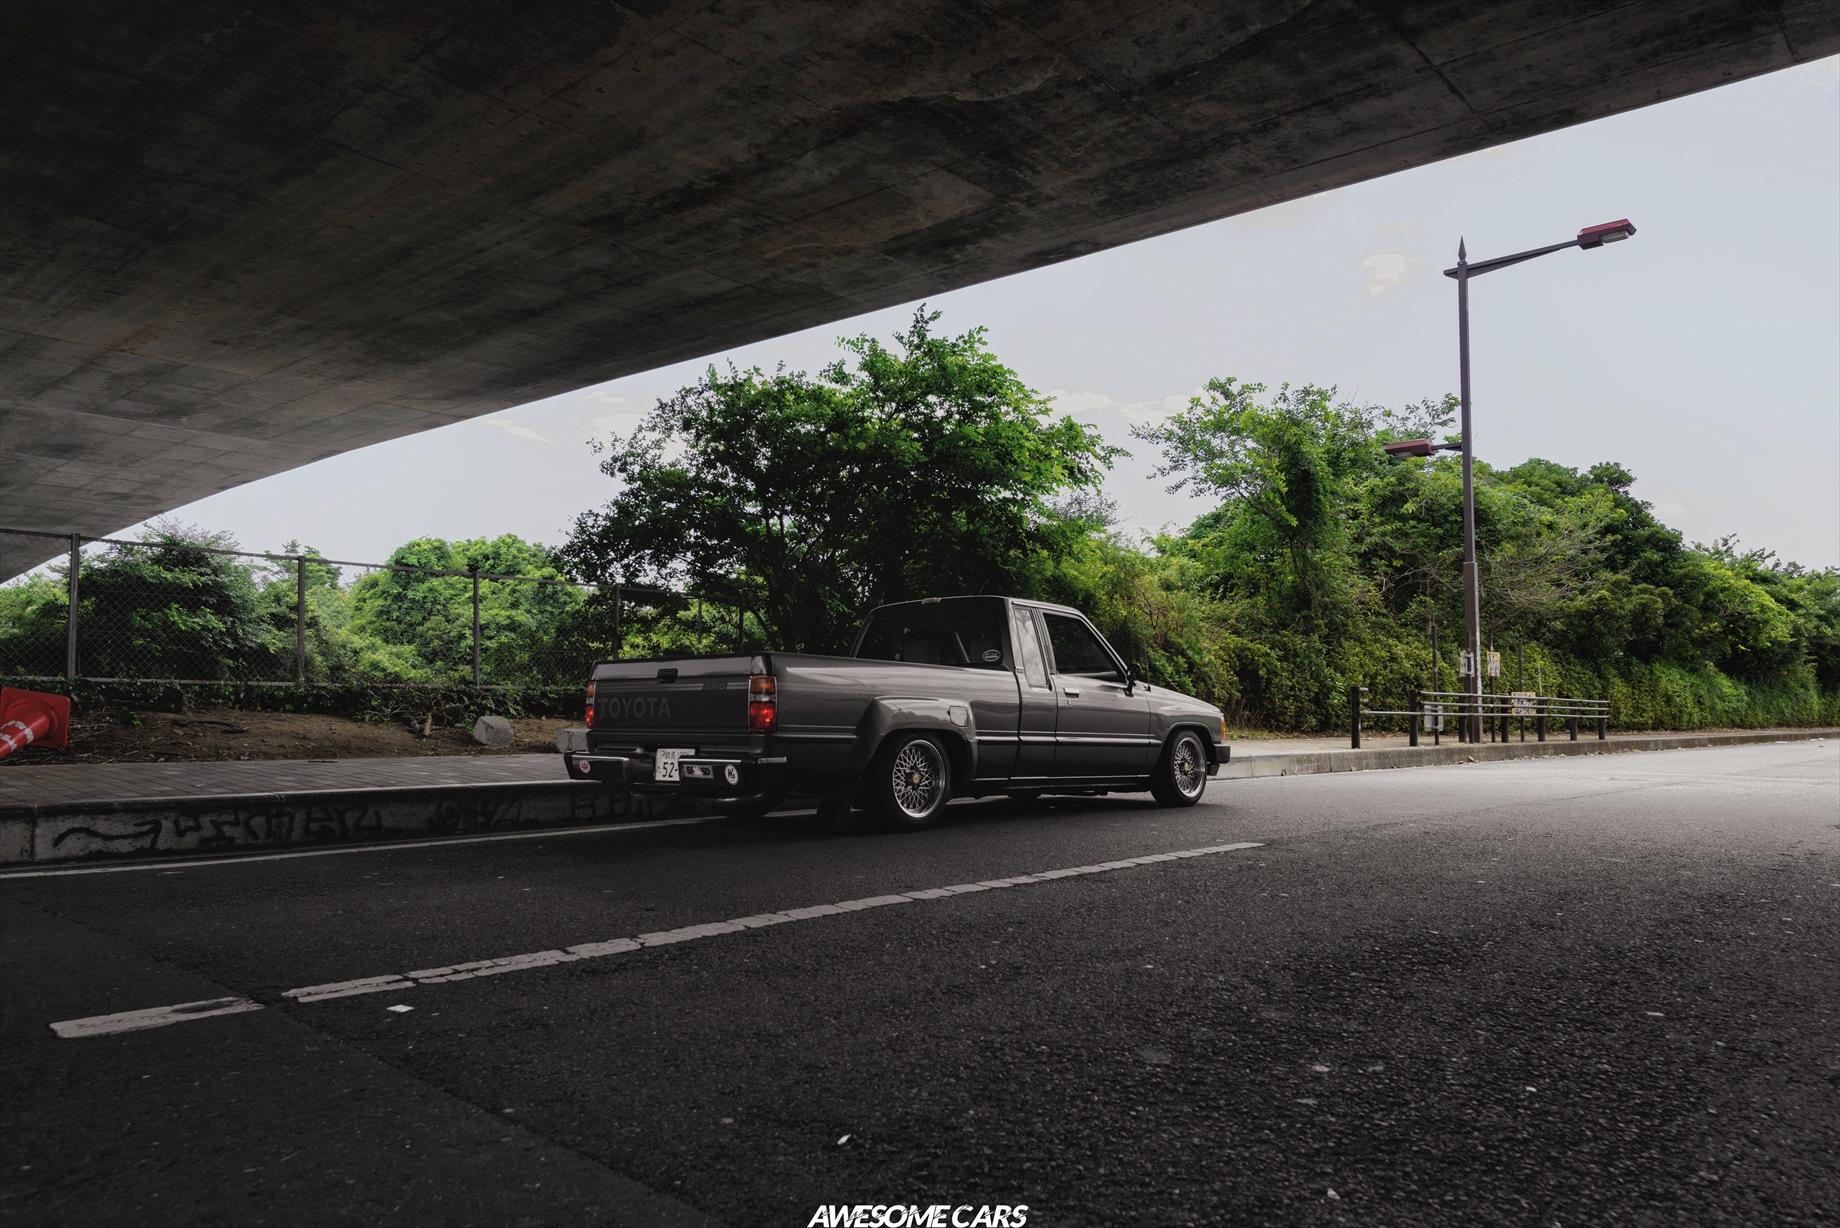 DSC_2441-Edit-3_R.jpg